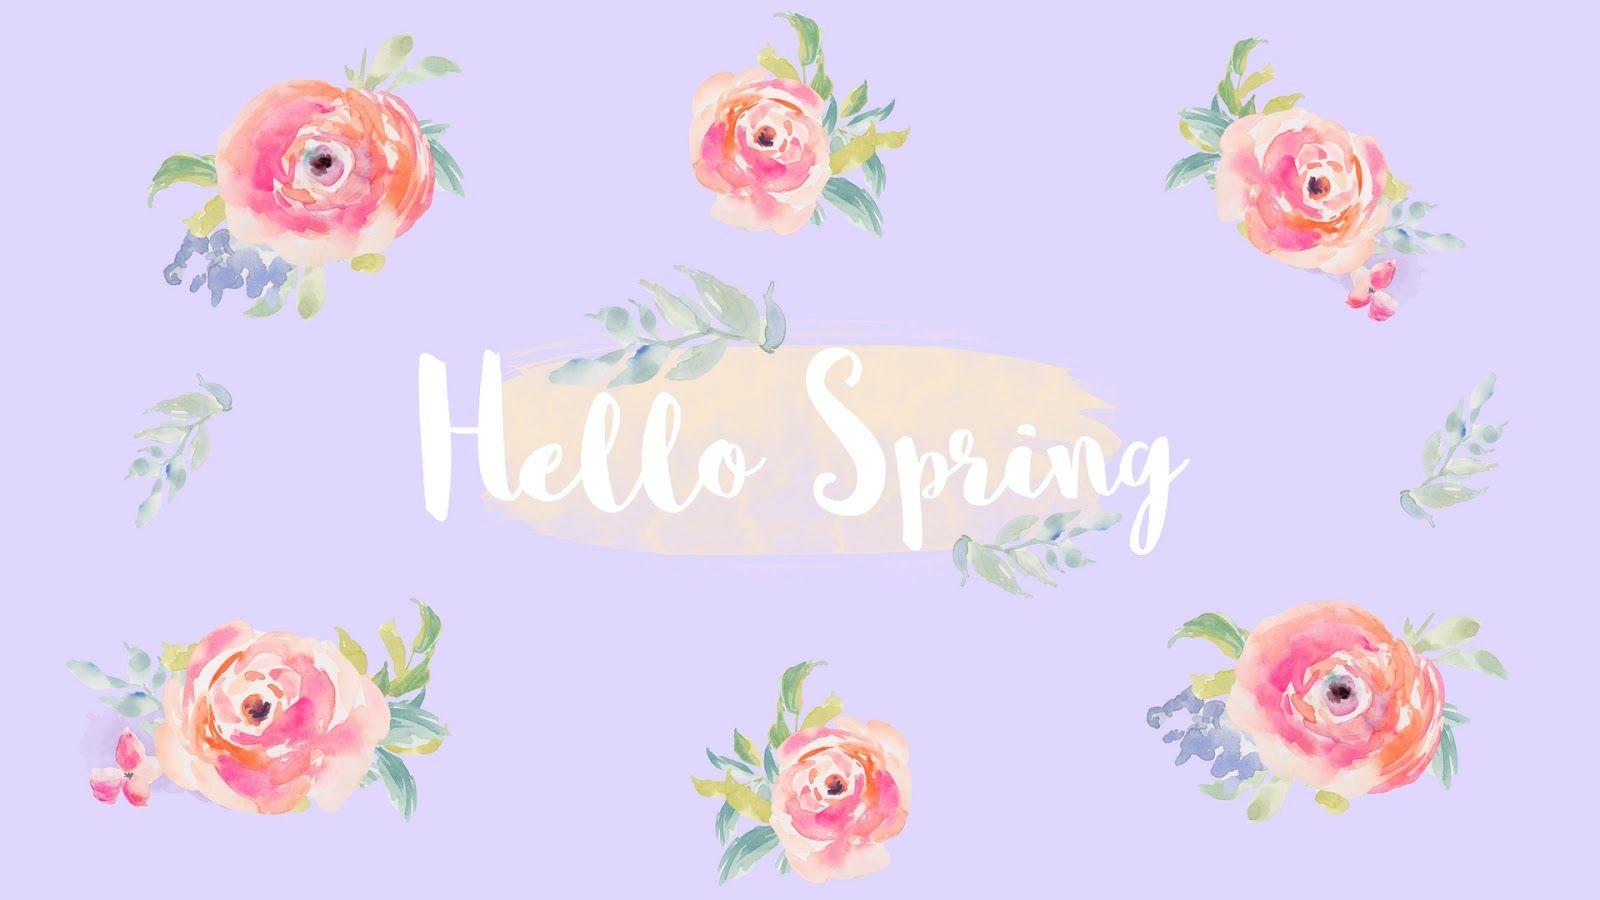 Free Spring Desktop Wallpapers Elizabeth Anne Spring Desktop Wallpaper Wallpaper Desktop Wallpaper